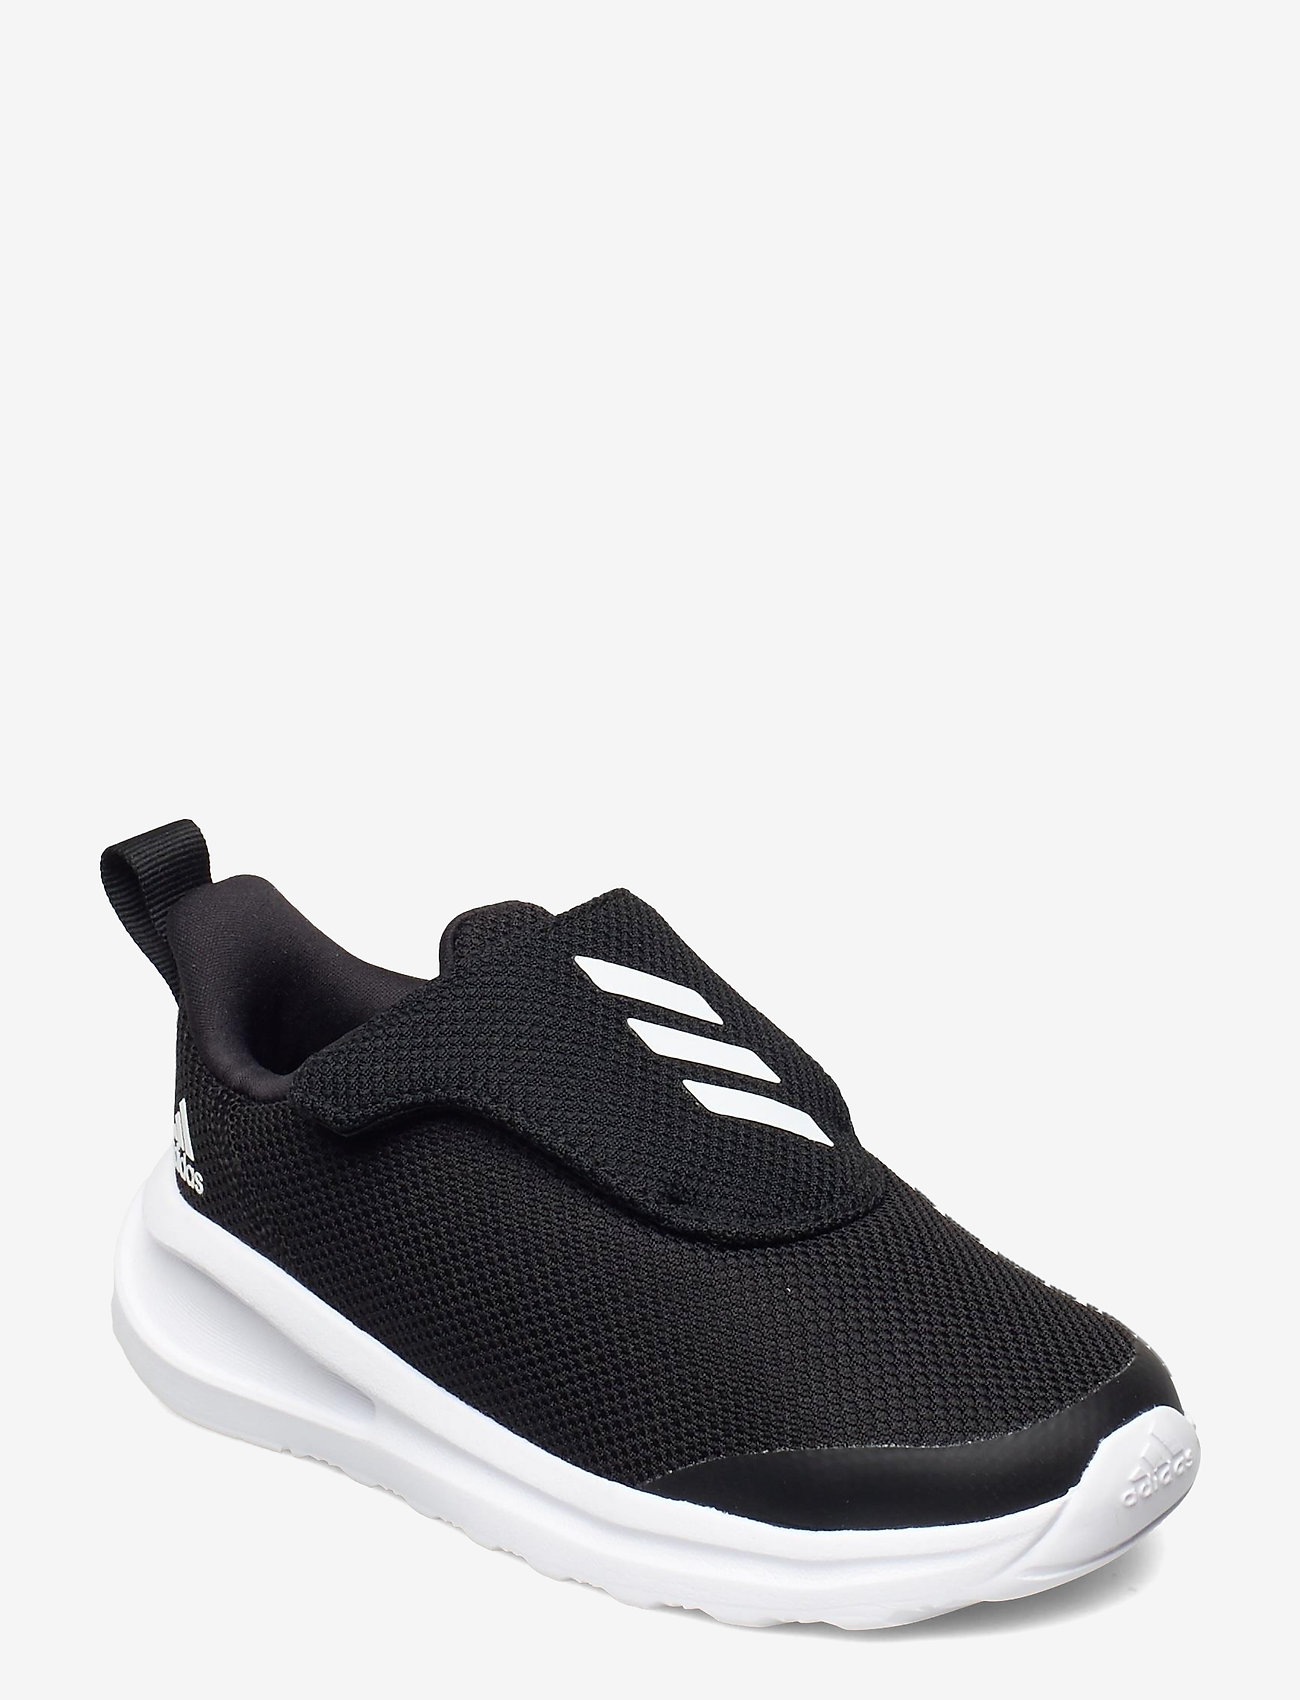 adidas Performance - FortaRun AC I - schuhe - cblack/ftwwht/cblack - 0